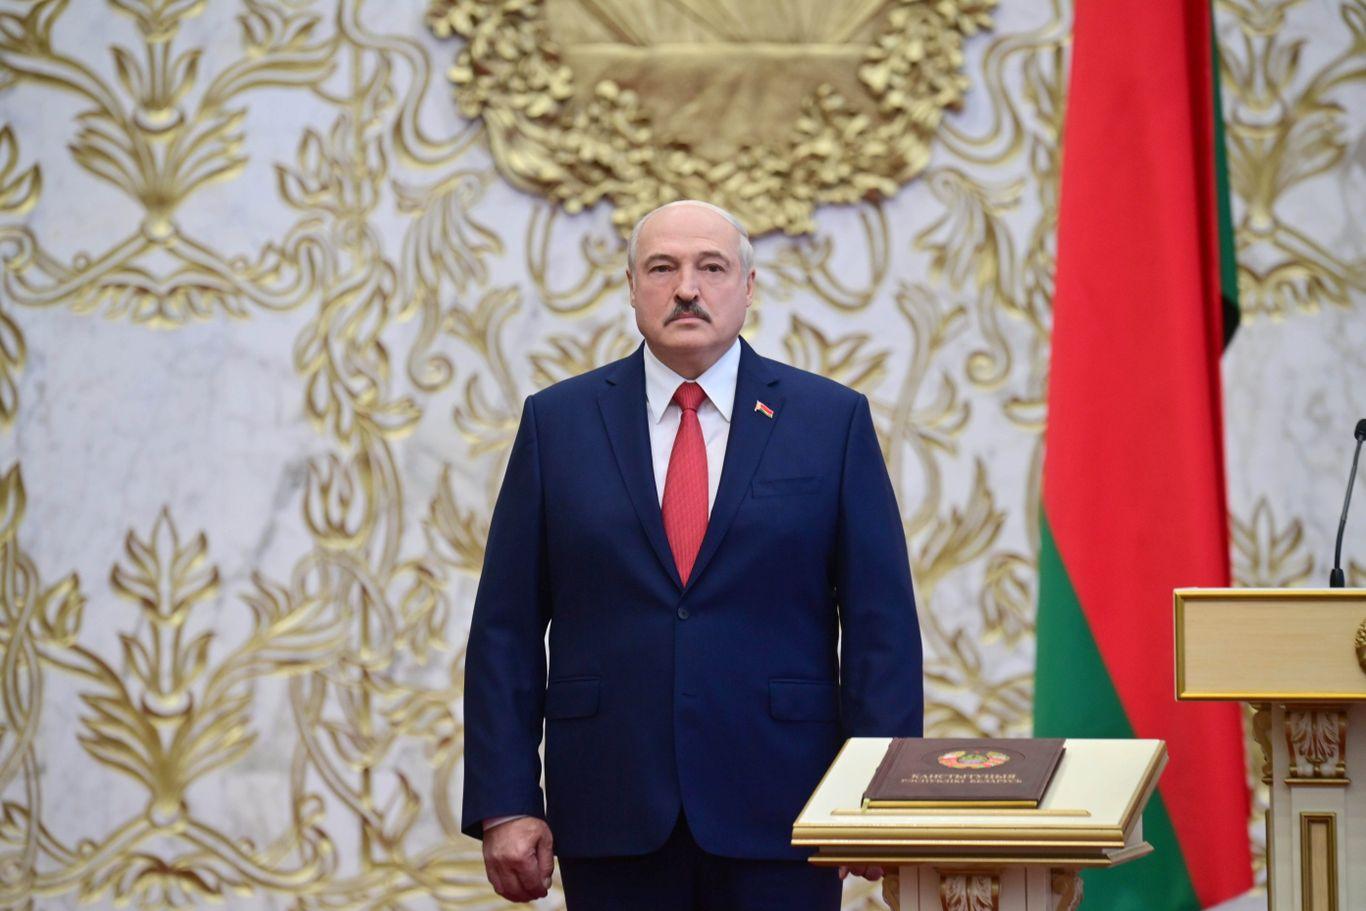 U.S. no longer recognizes Lukashenko as president of Belarus